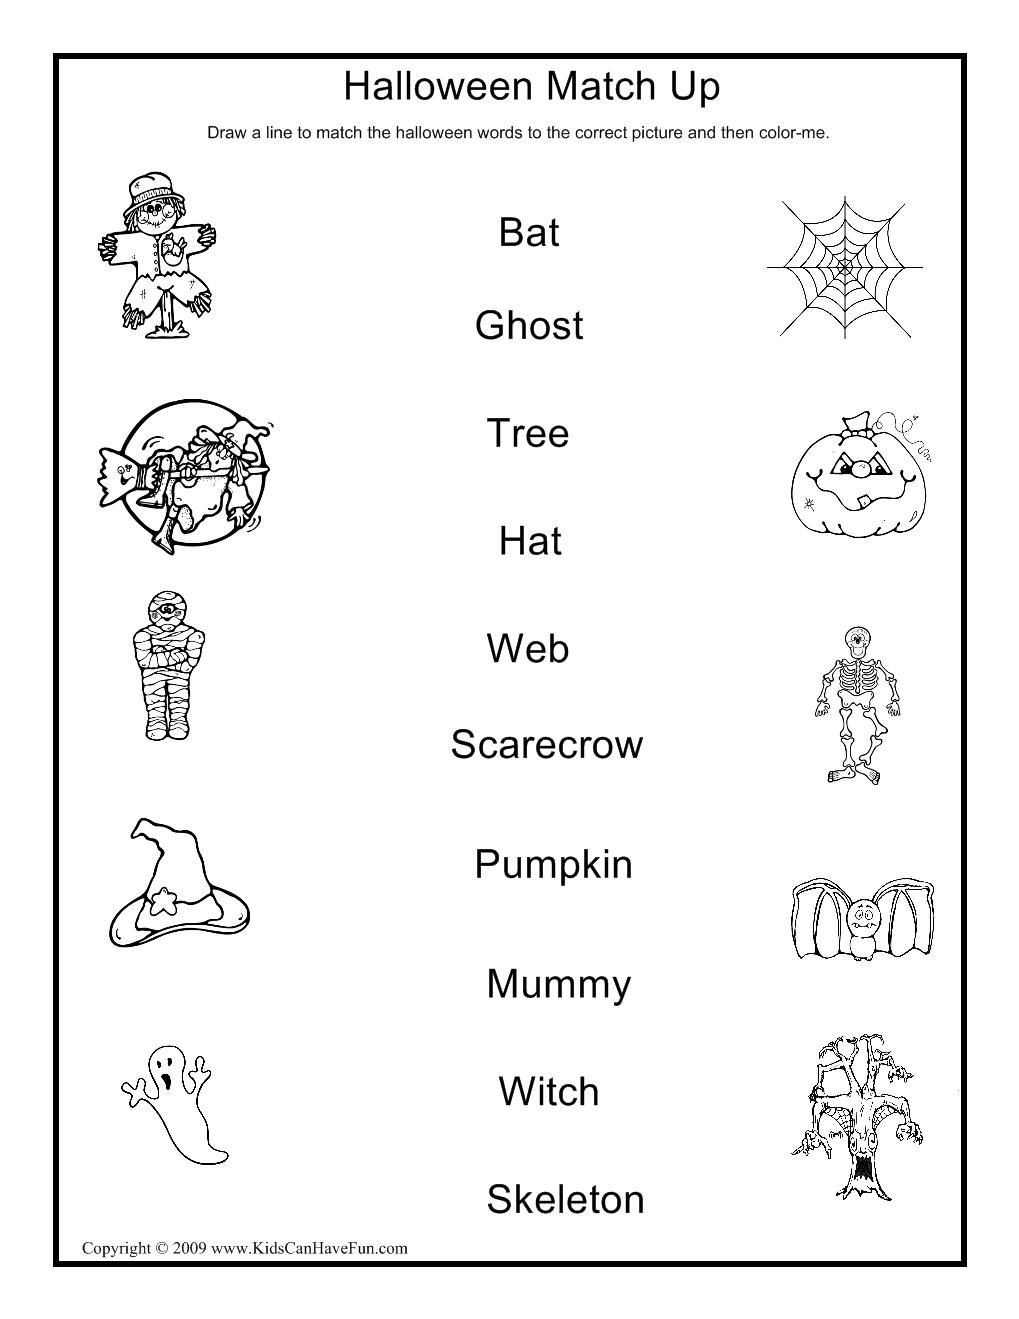 Halloween Match Up Activity | English Activities For Kids